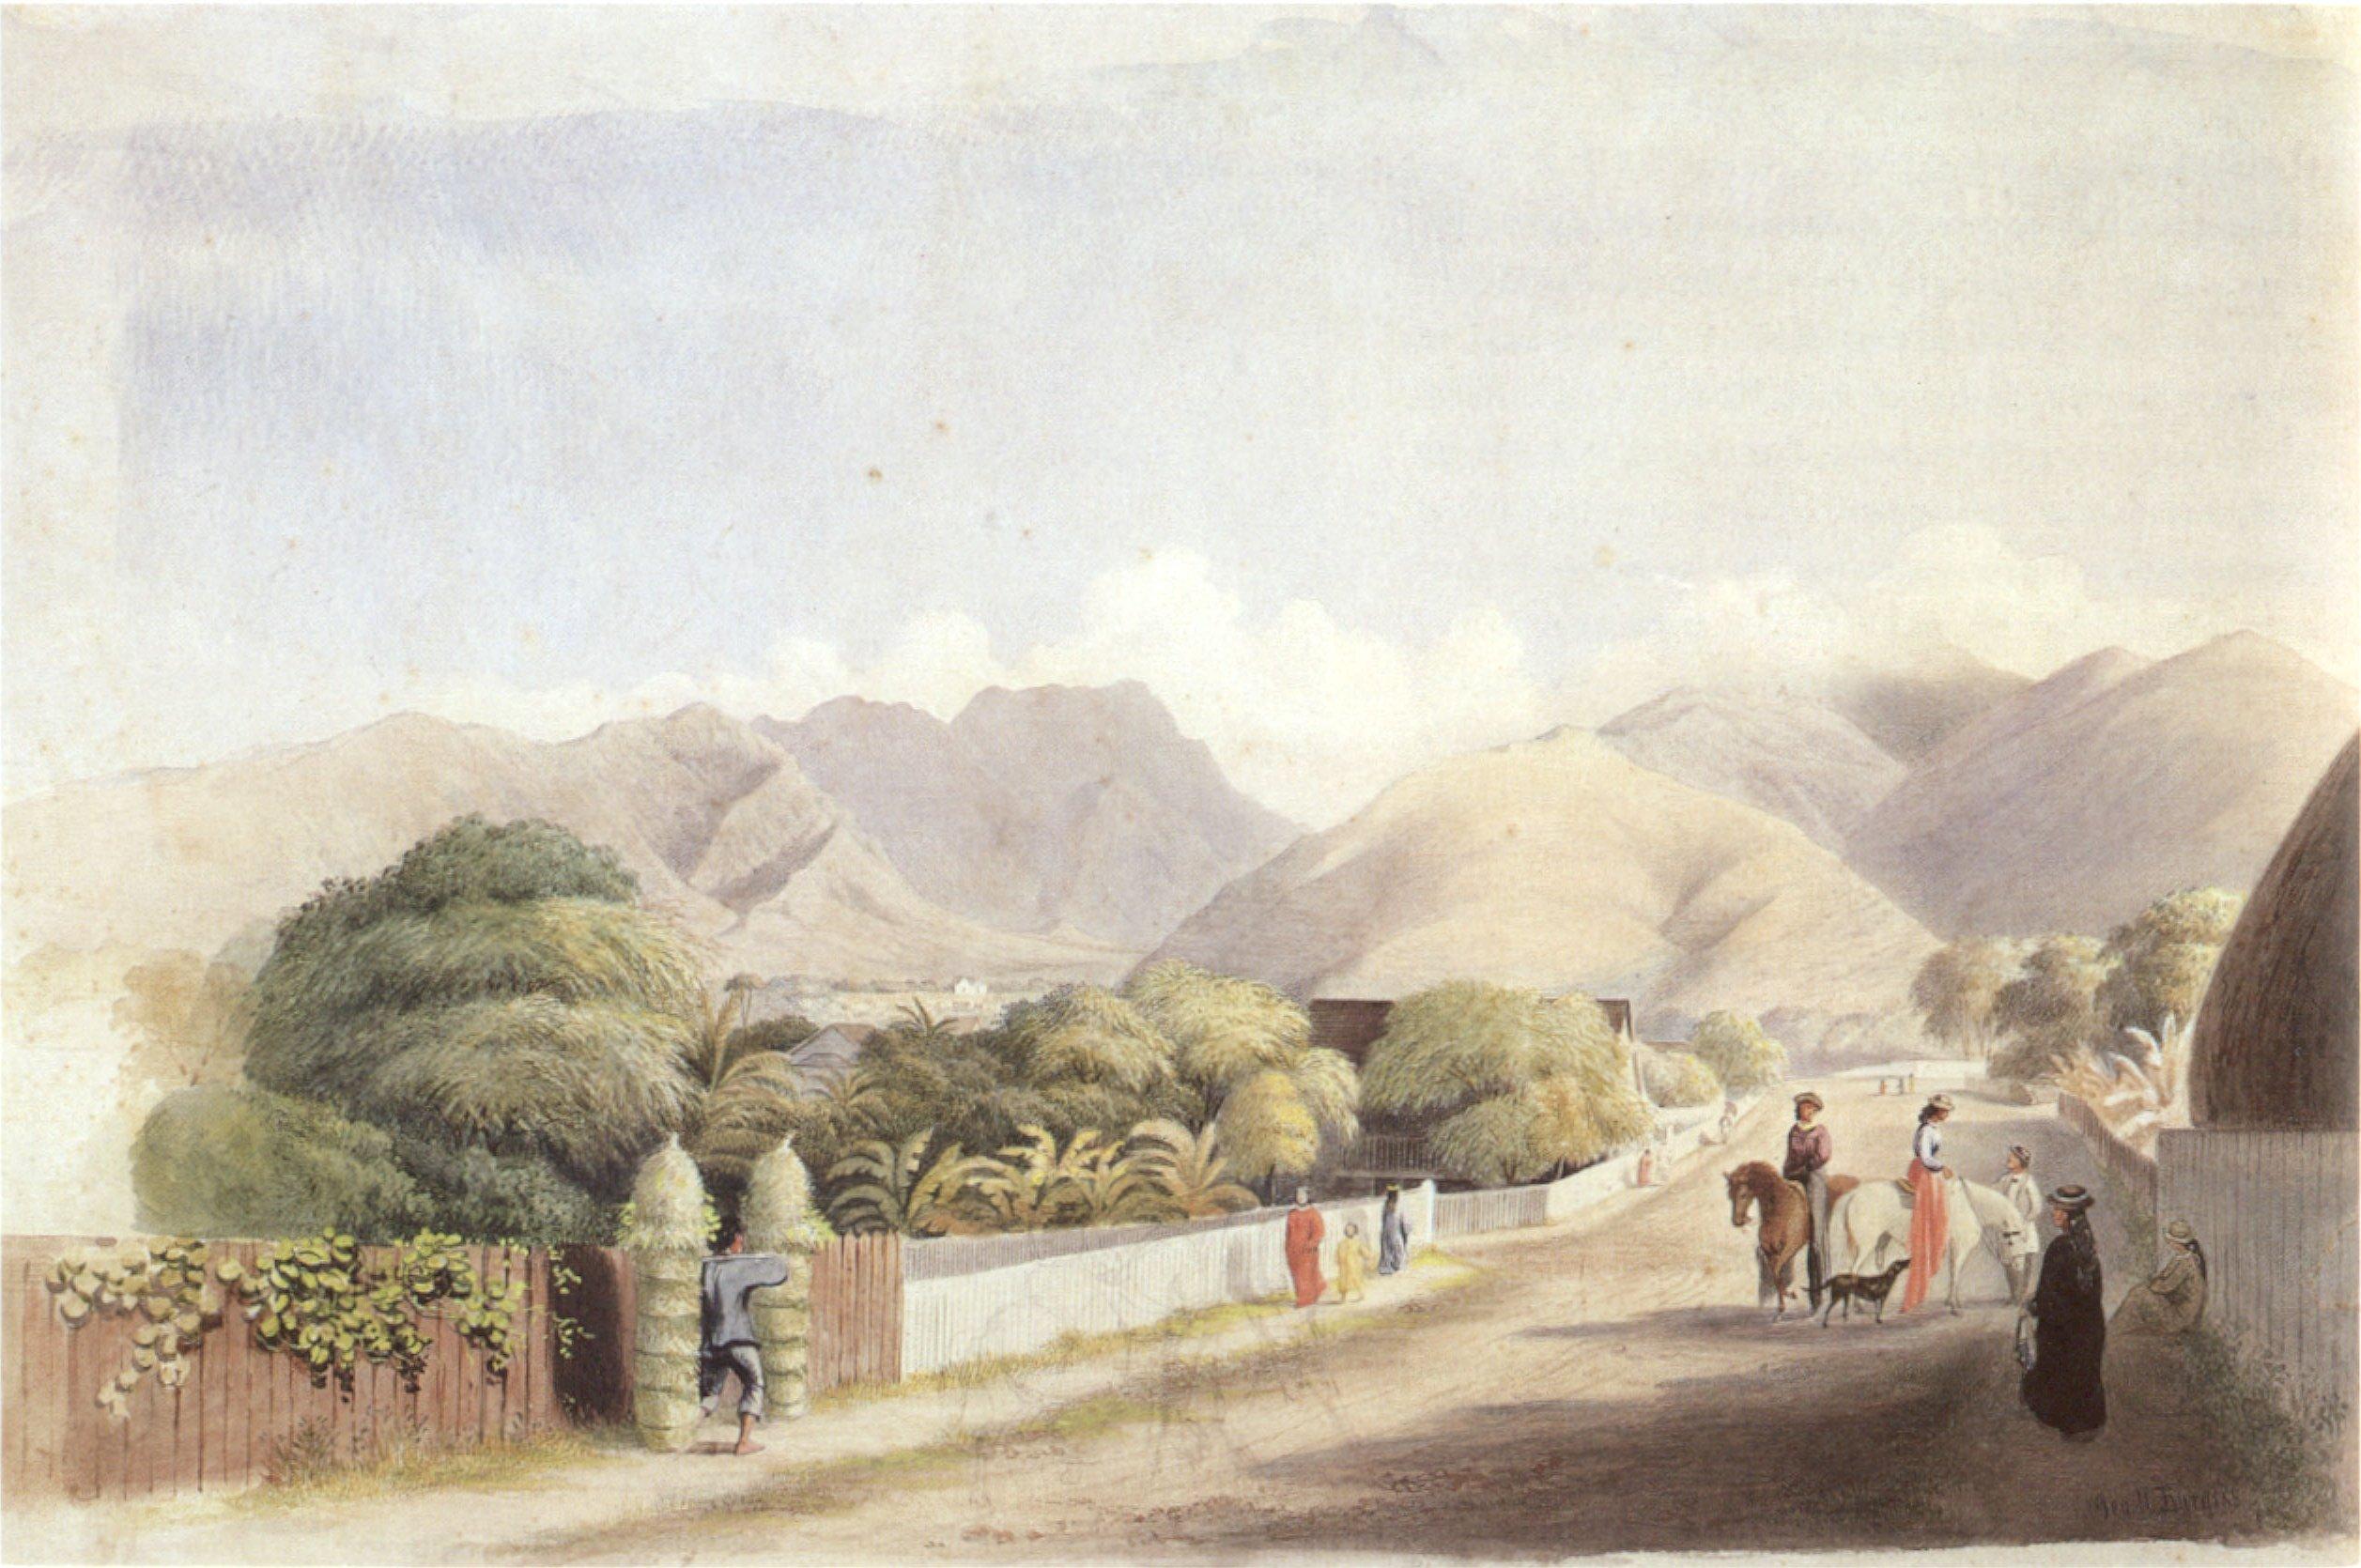 History of watercolor art - File George Henry Burgess Upper Fort Street Honolulu Watercolor Over